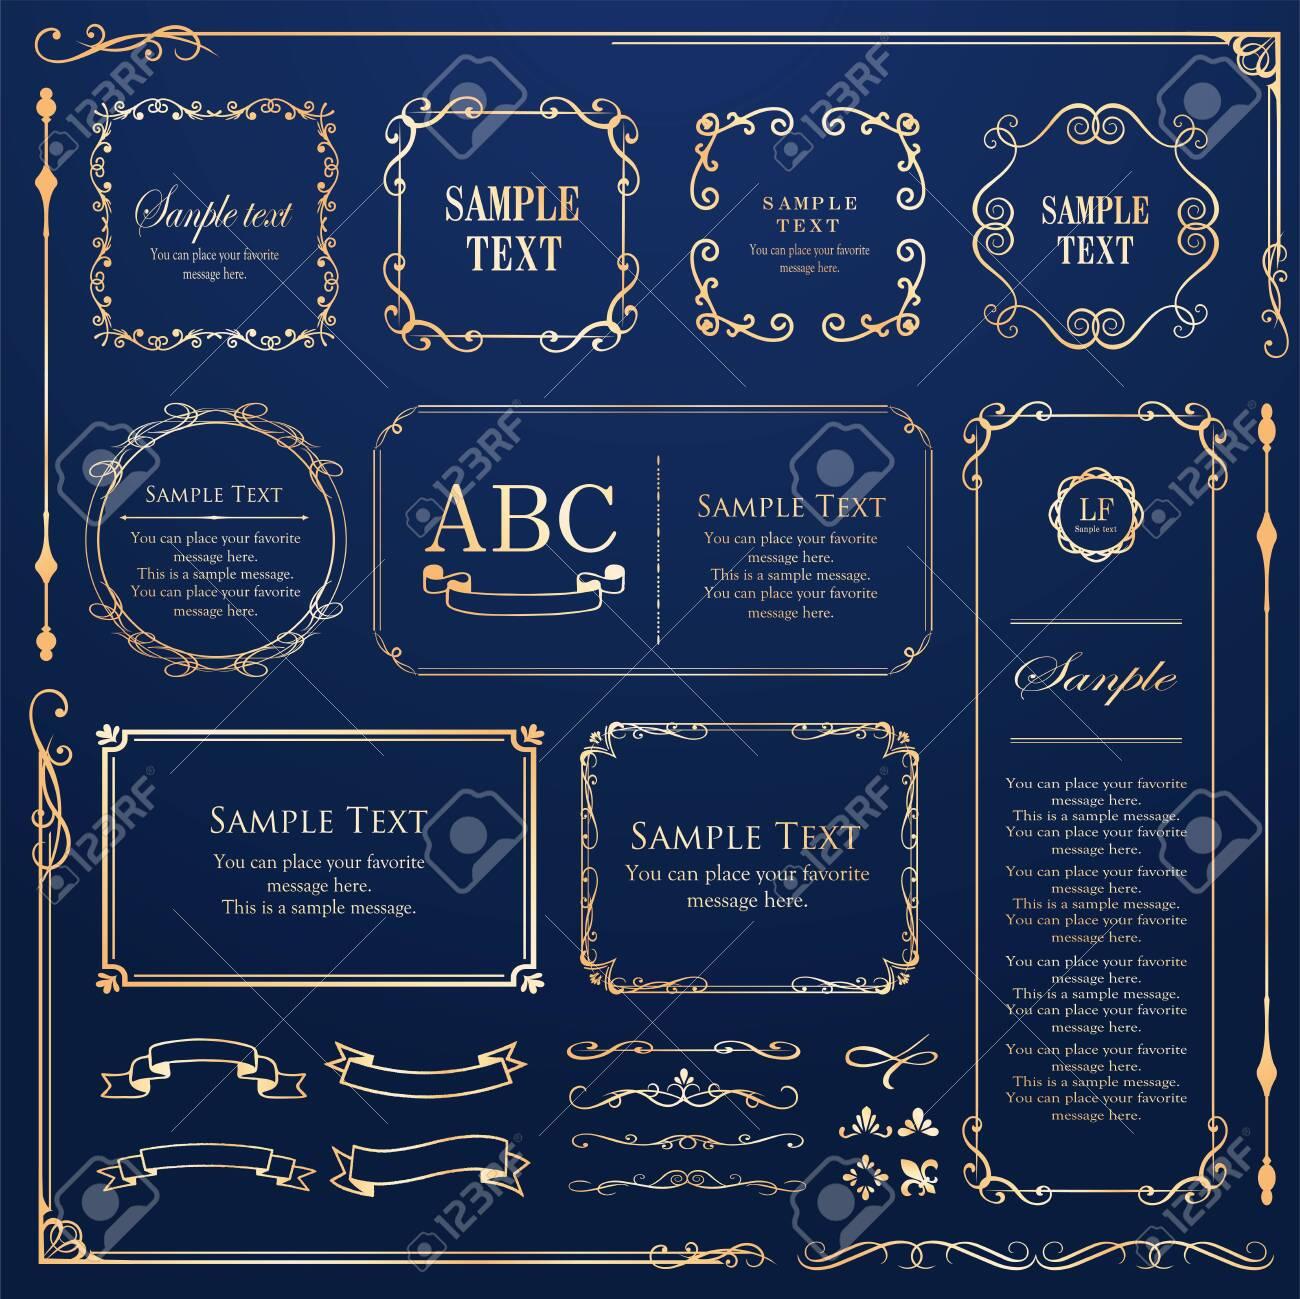 Vector set of vintage elements for design. Ornamental frames, borders, dividers, banners, arrows, monogram, corners, square, template. Pear and flower vignette. Premium gold style - 130850327